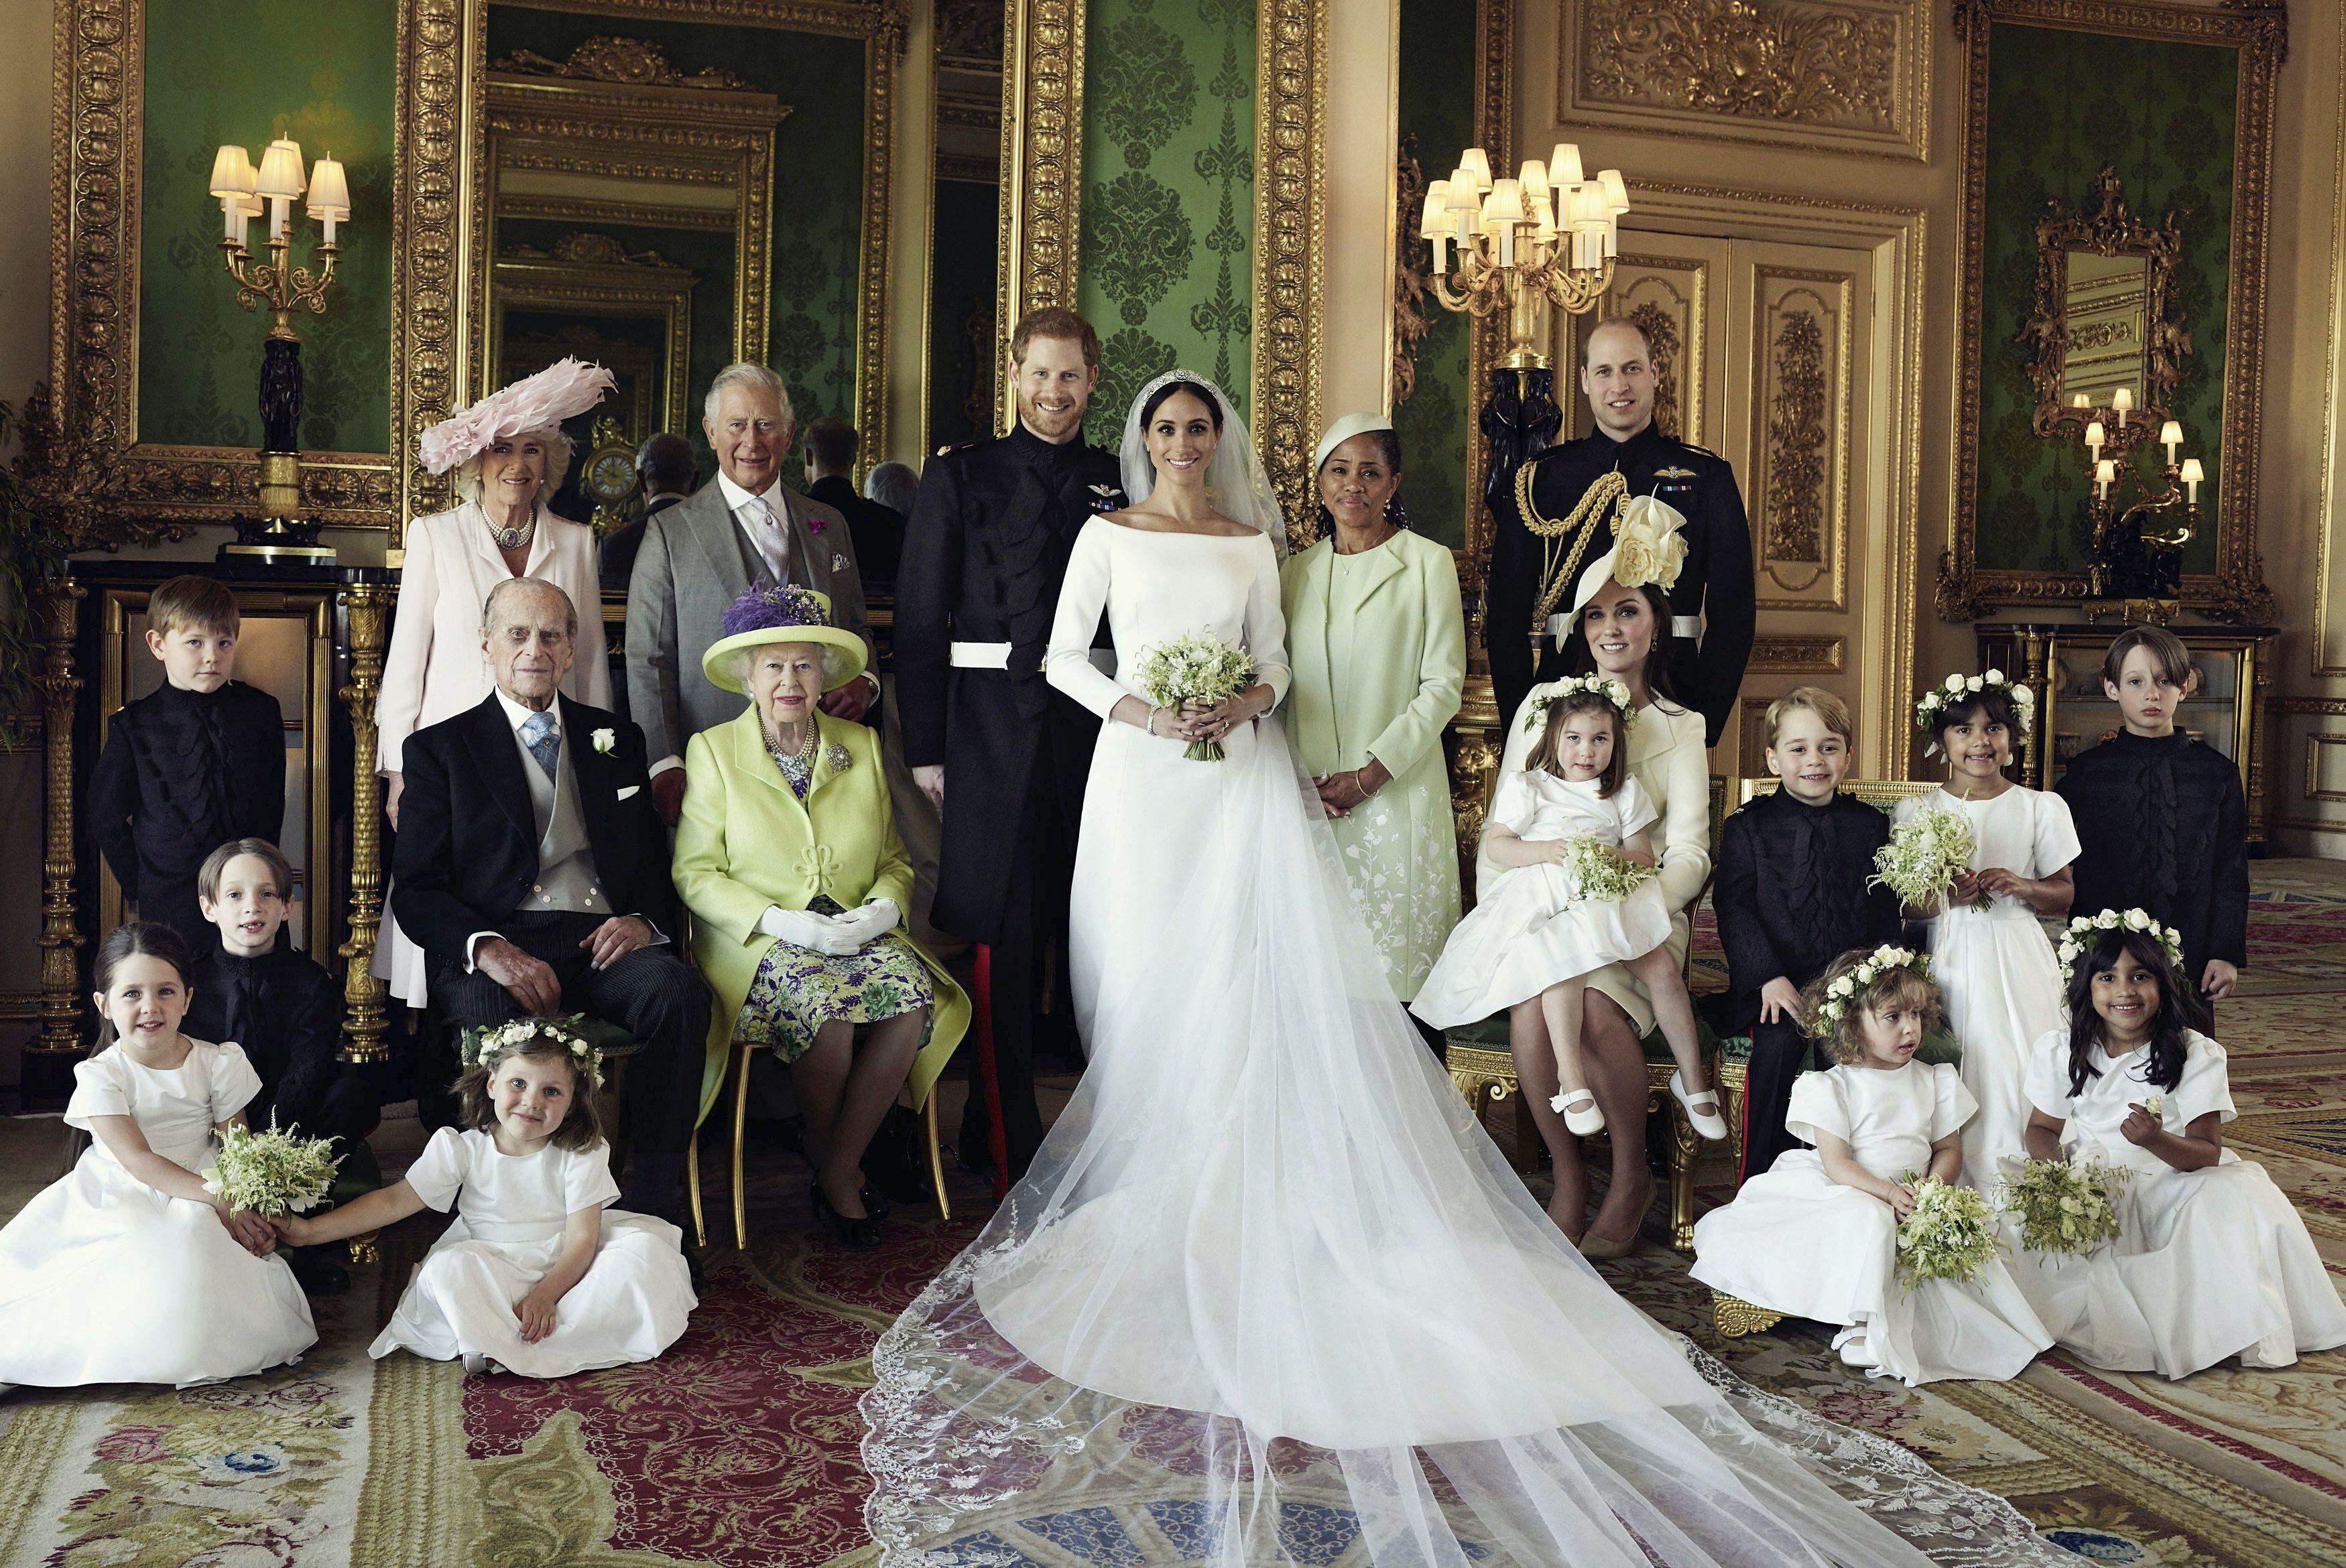 Family Portrait Royal Wedding 2018